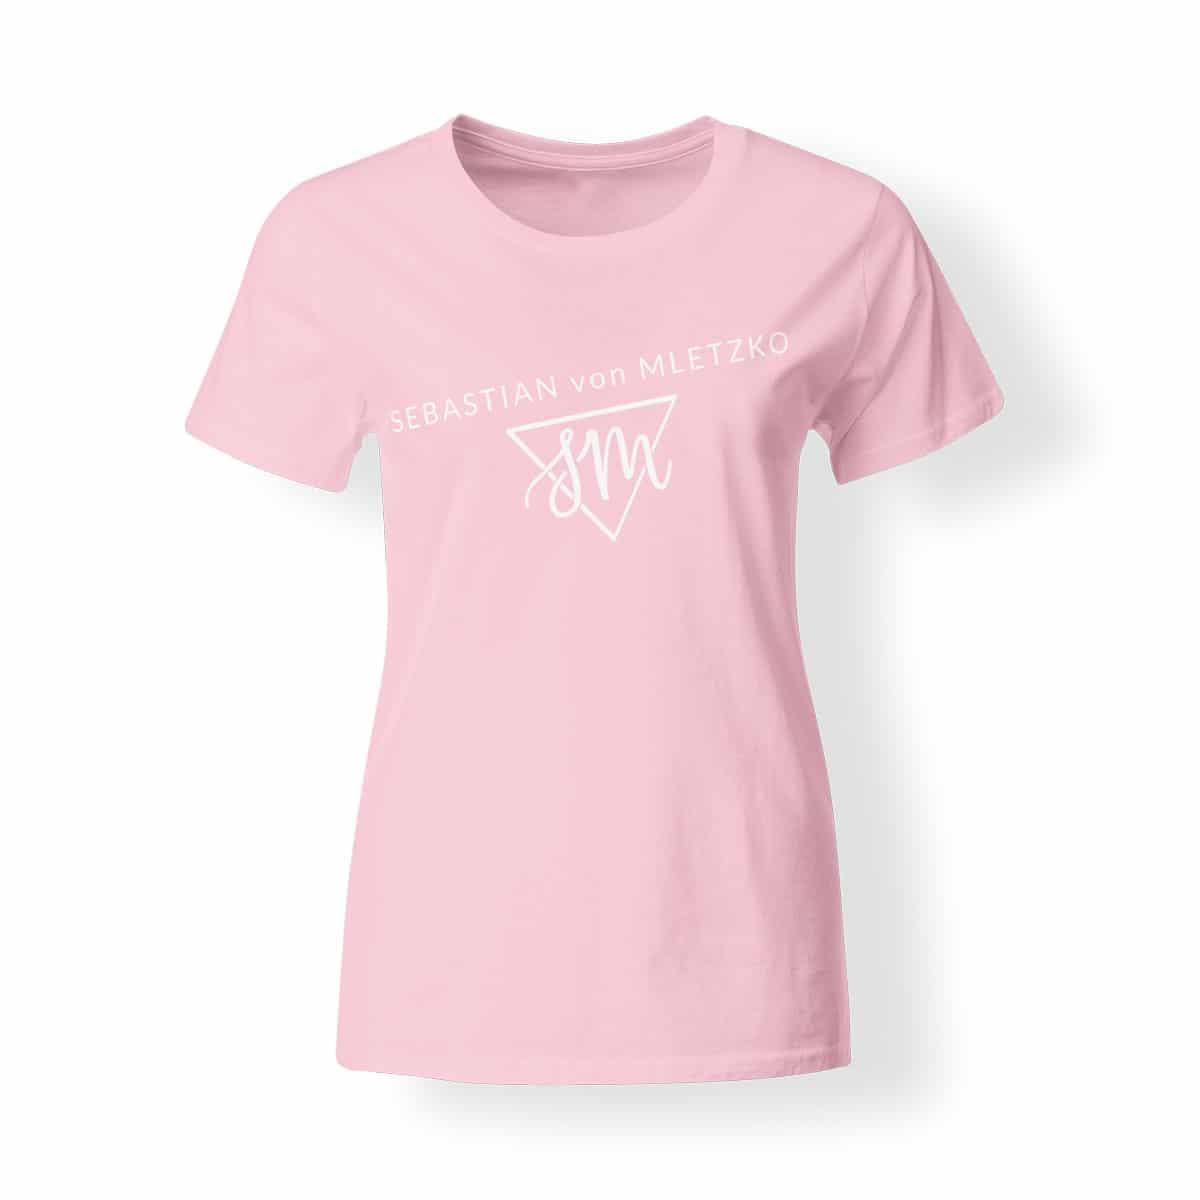 Sebastian von Mletzko T-Shirt Damen rosa